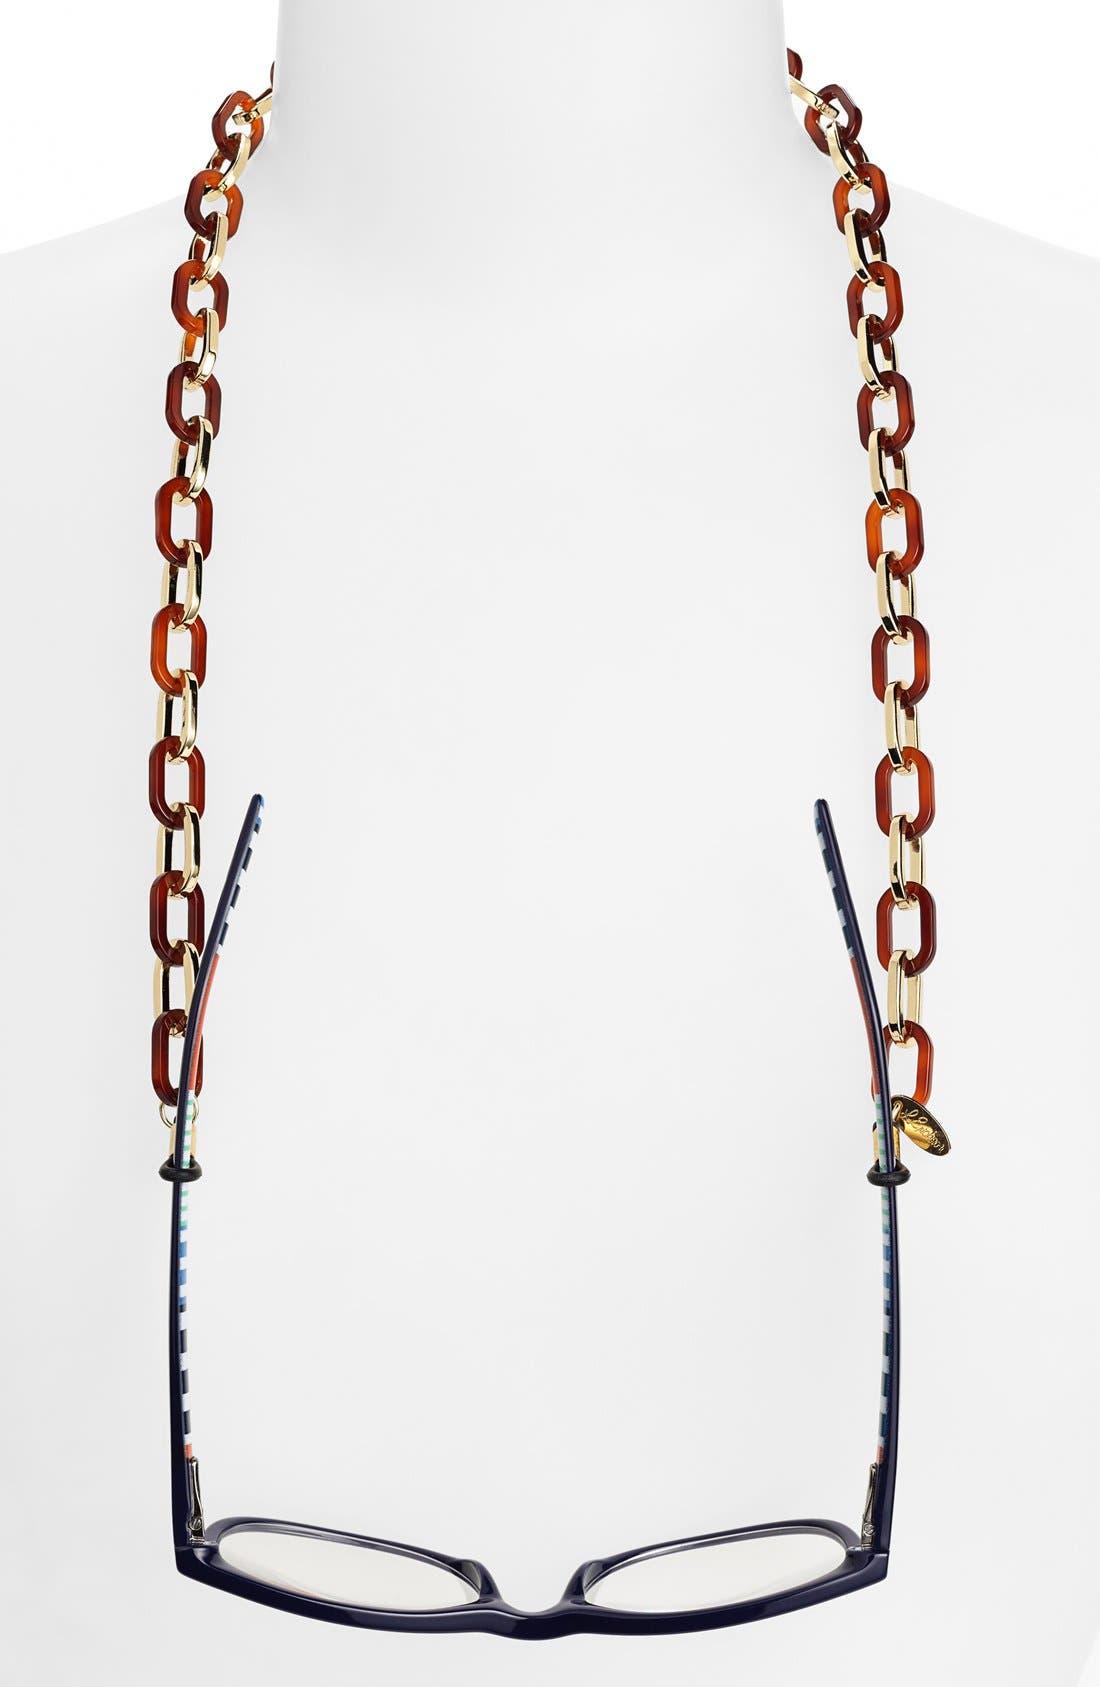 Main Image - L. Erickson 'Sarafine' Metal Link Eyewear Chain